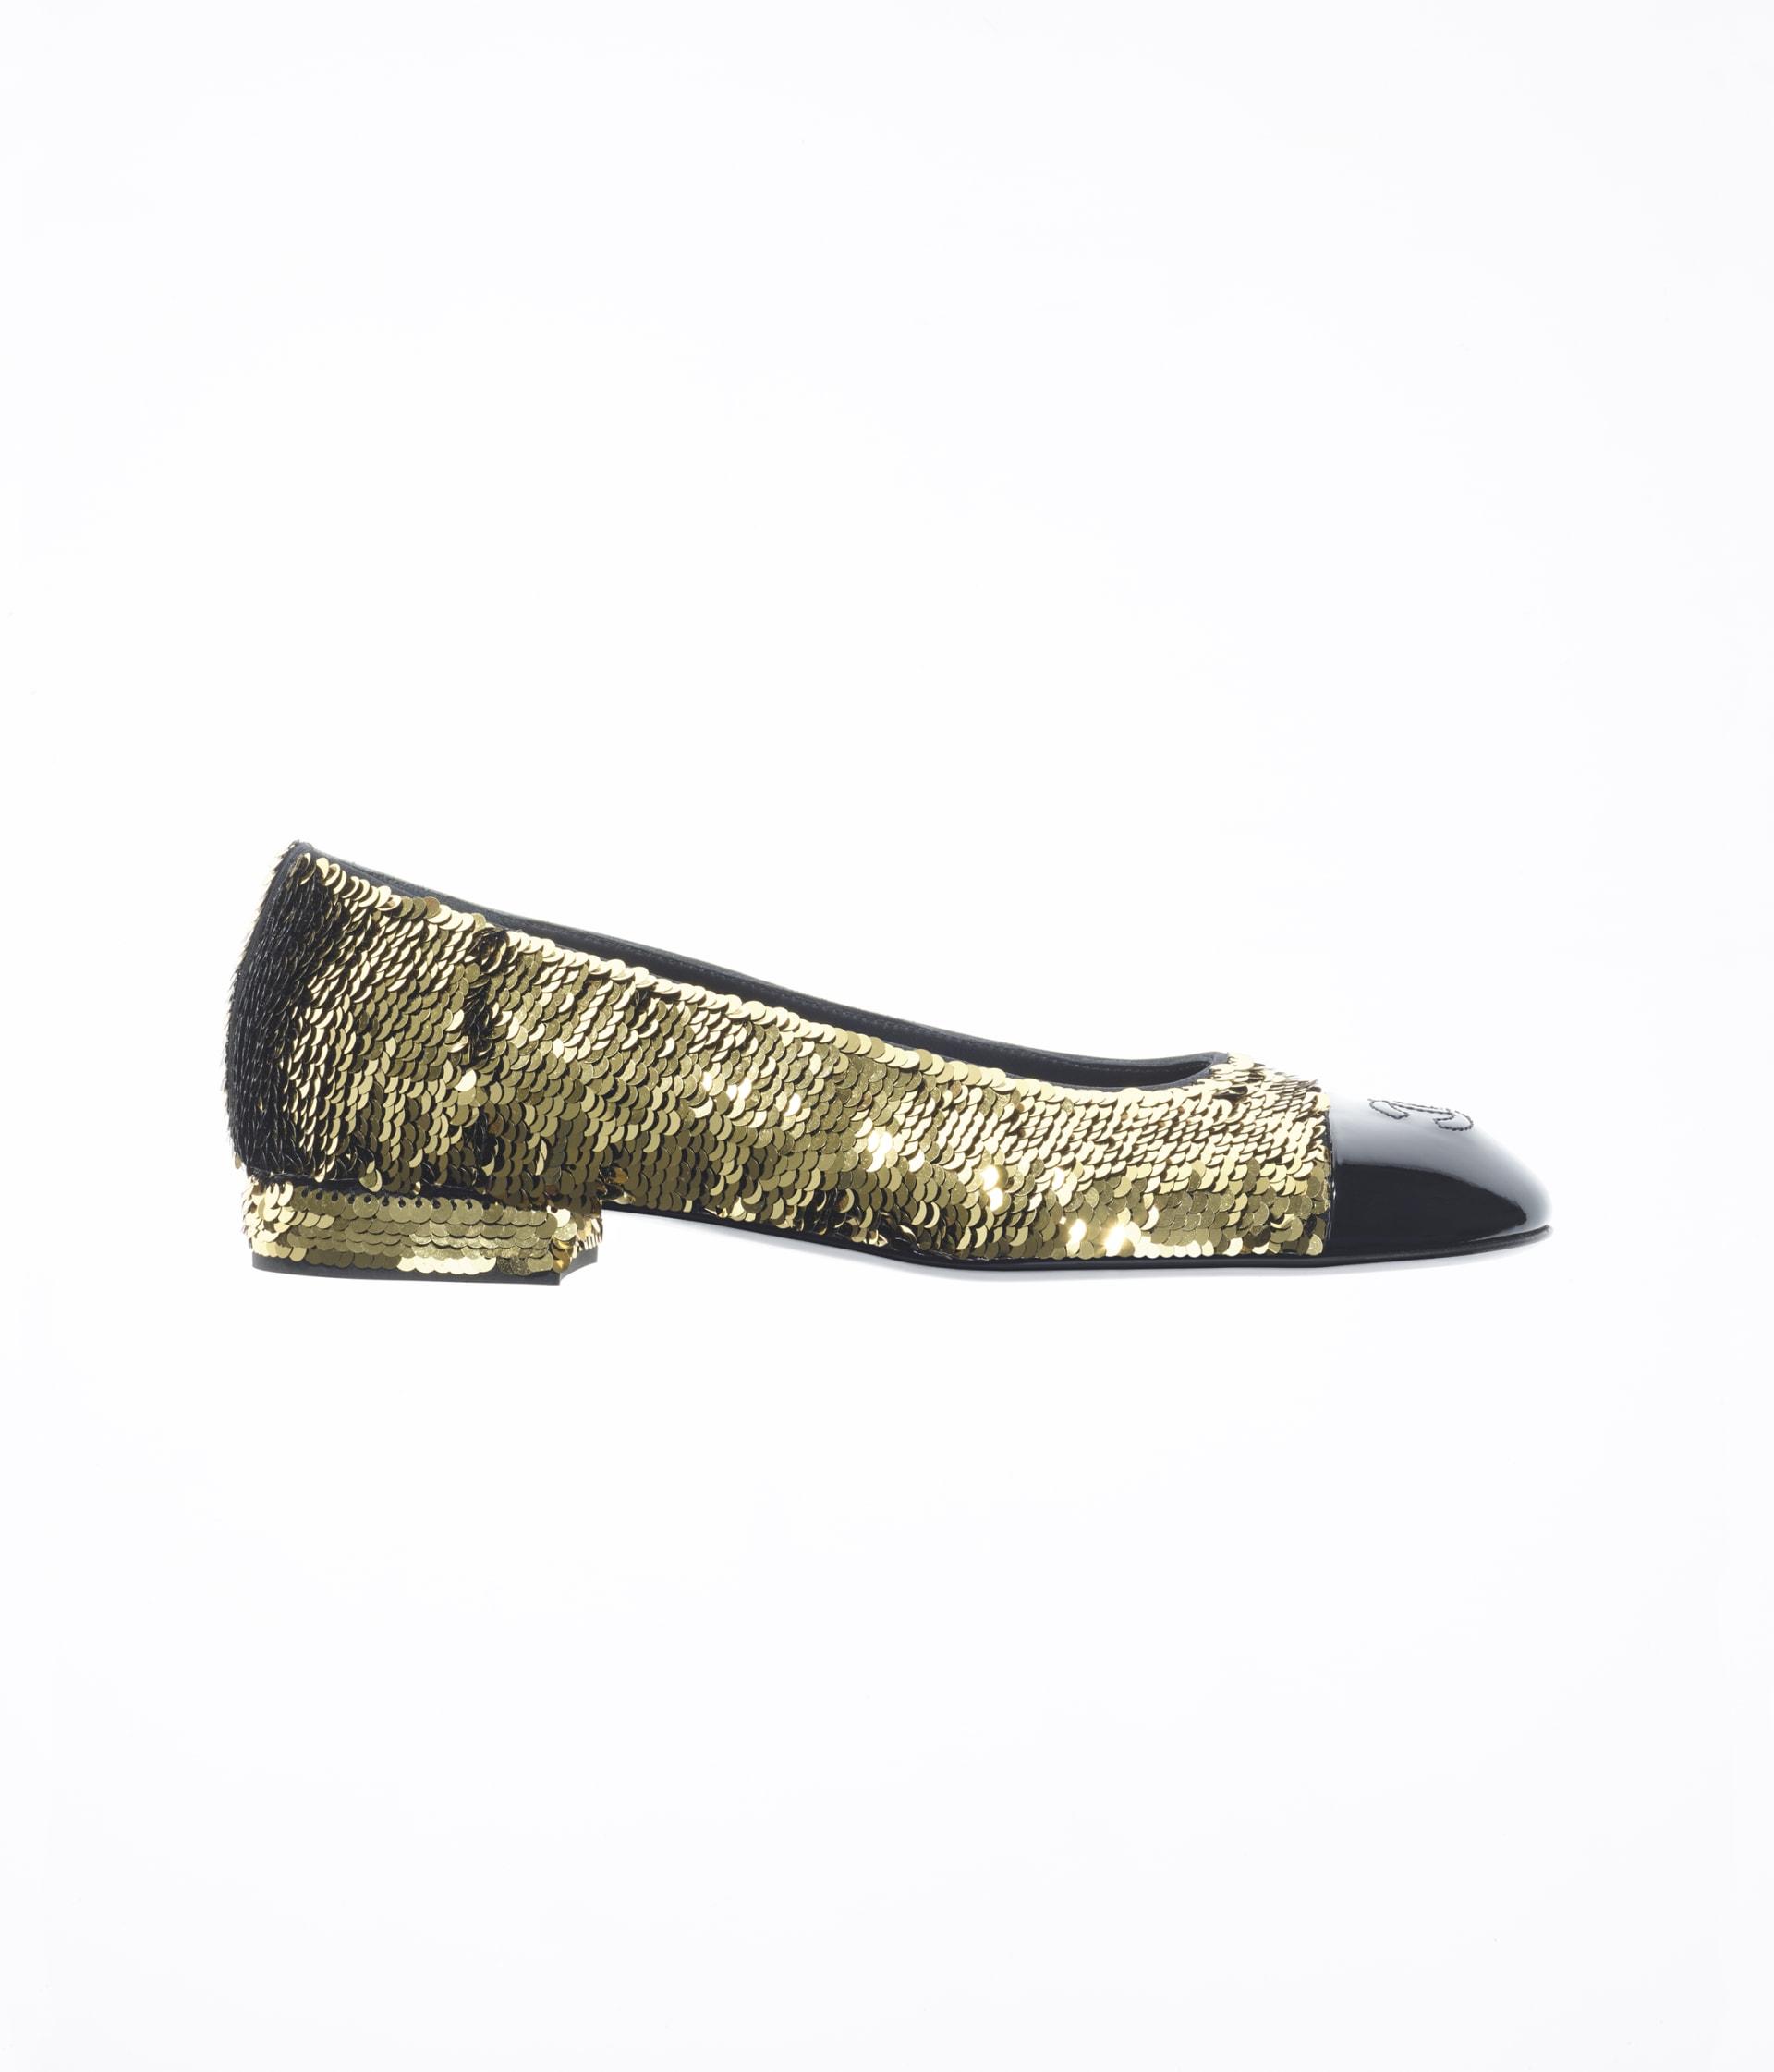 image 1 - Ballerinas - Sequins & Patent Calfskin - Gold & Black